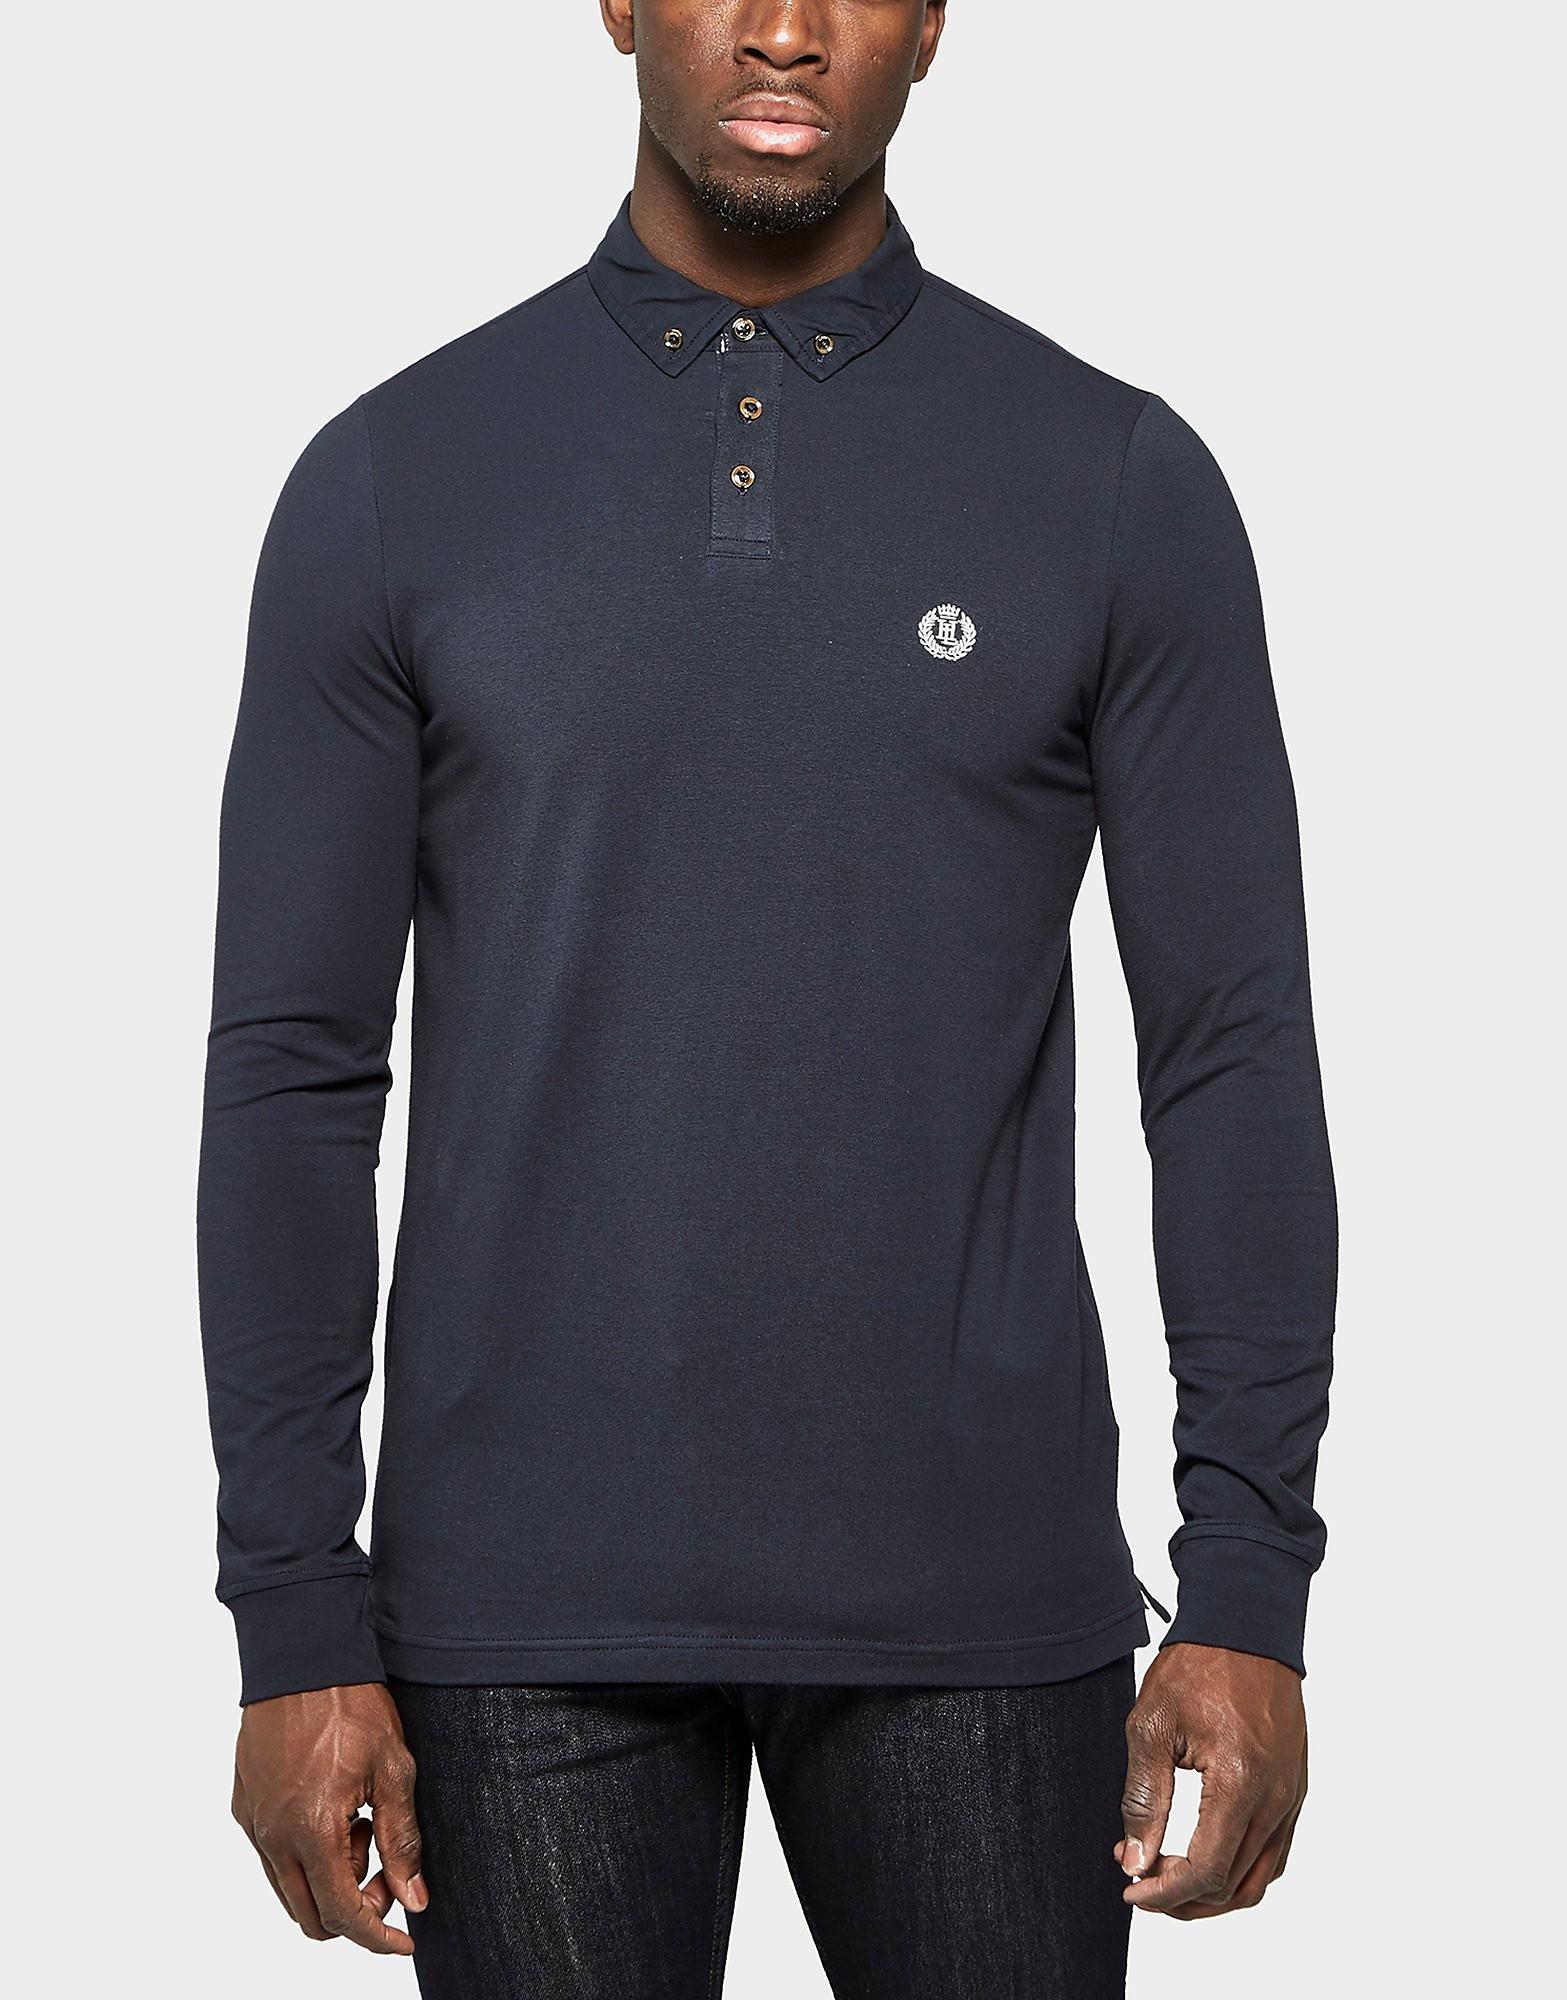 Henri Lloyd Adel Long Sleeve Polo Shirt  Navy Navy